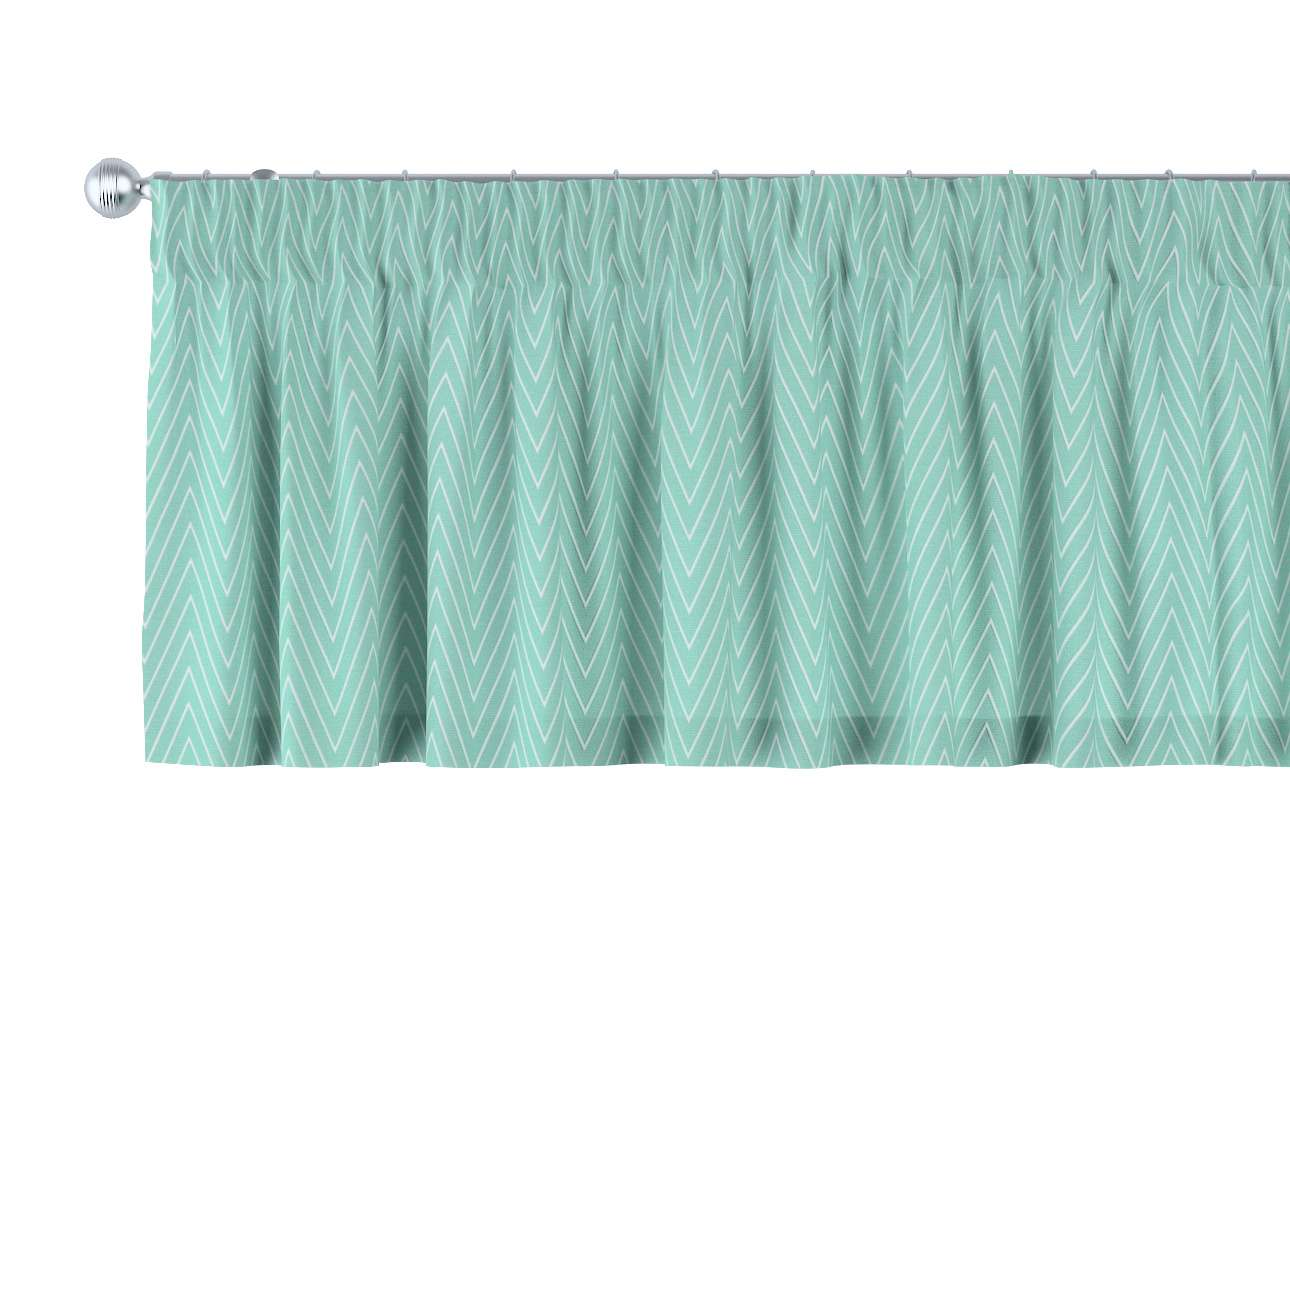 Kurzgardine mit Kräuselband 130 x 40 cm von der Kollektion Brooklyn, Stoff: 137-90